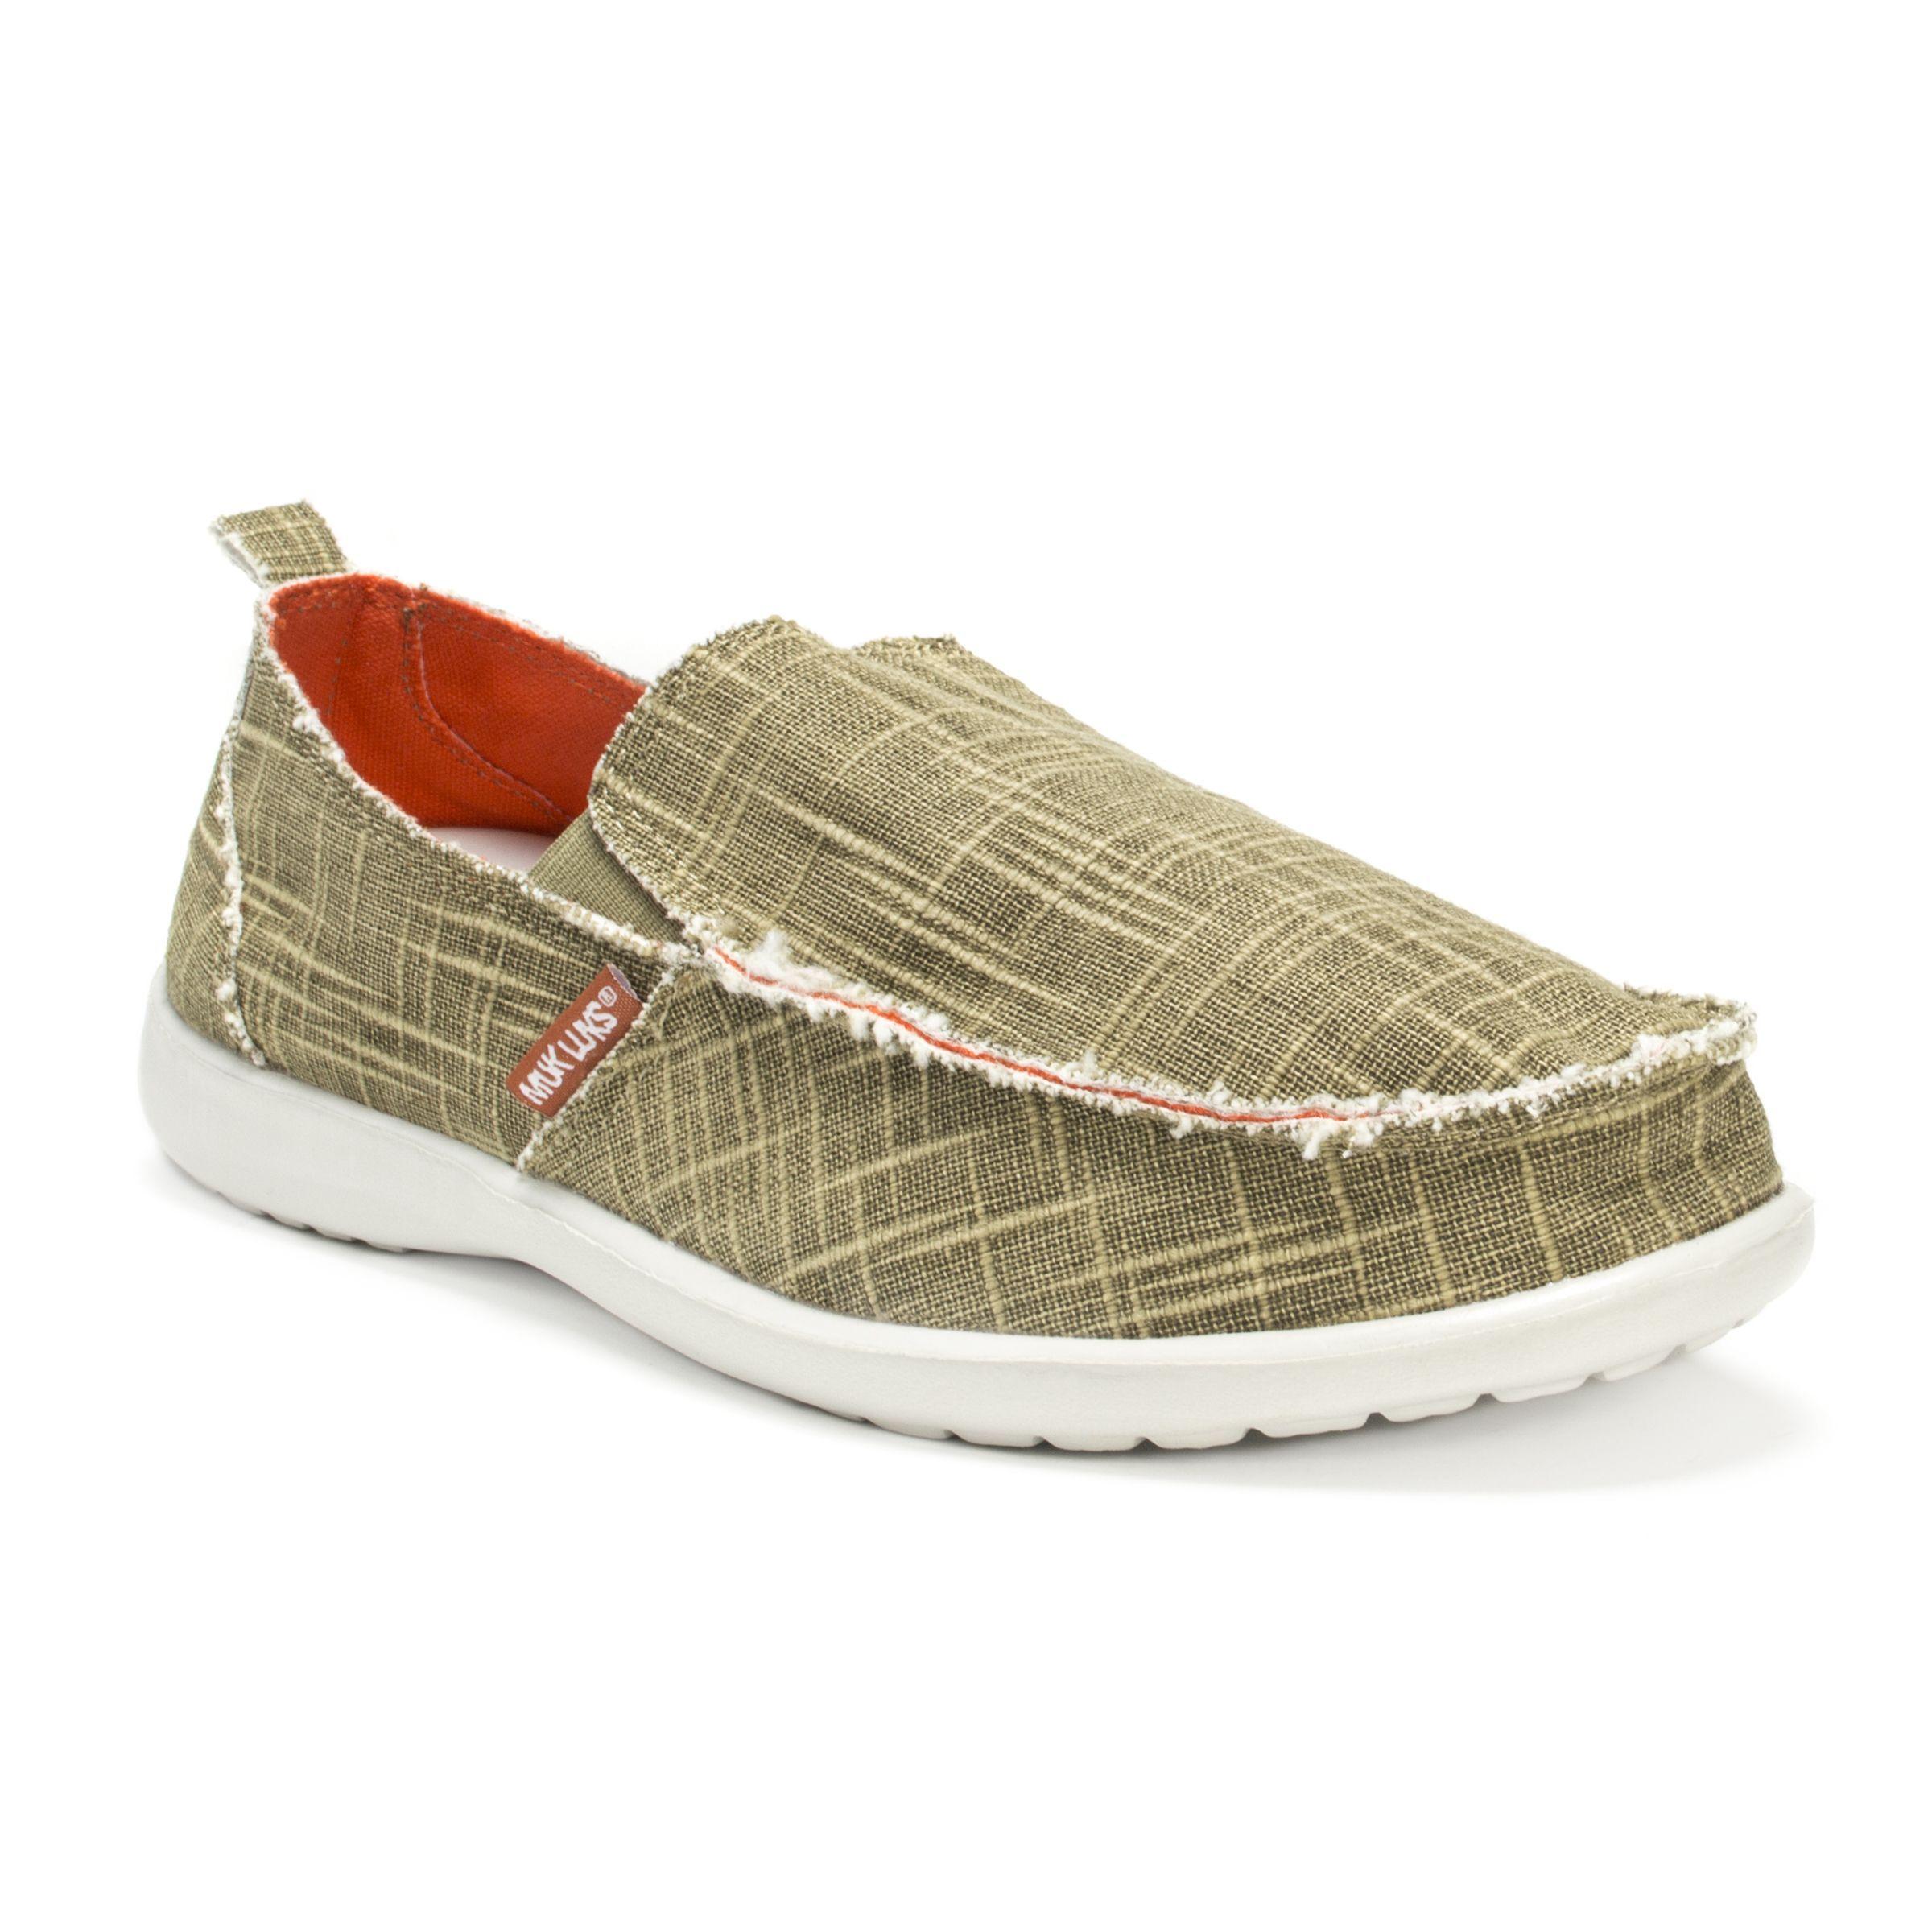 Muk Luks Men's Andy Shoes